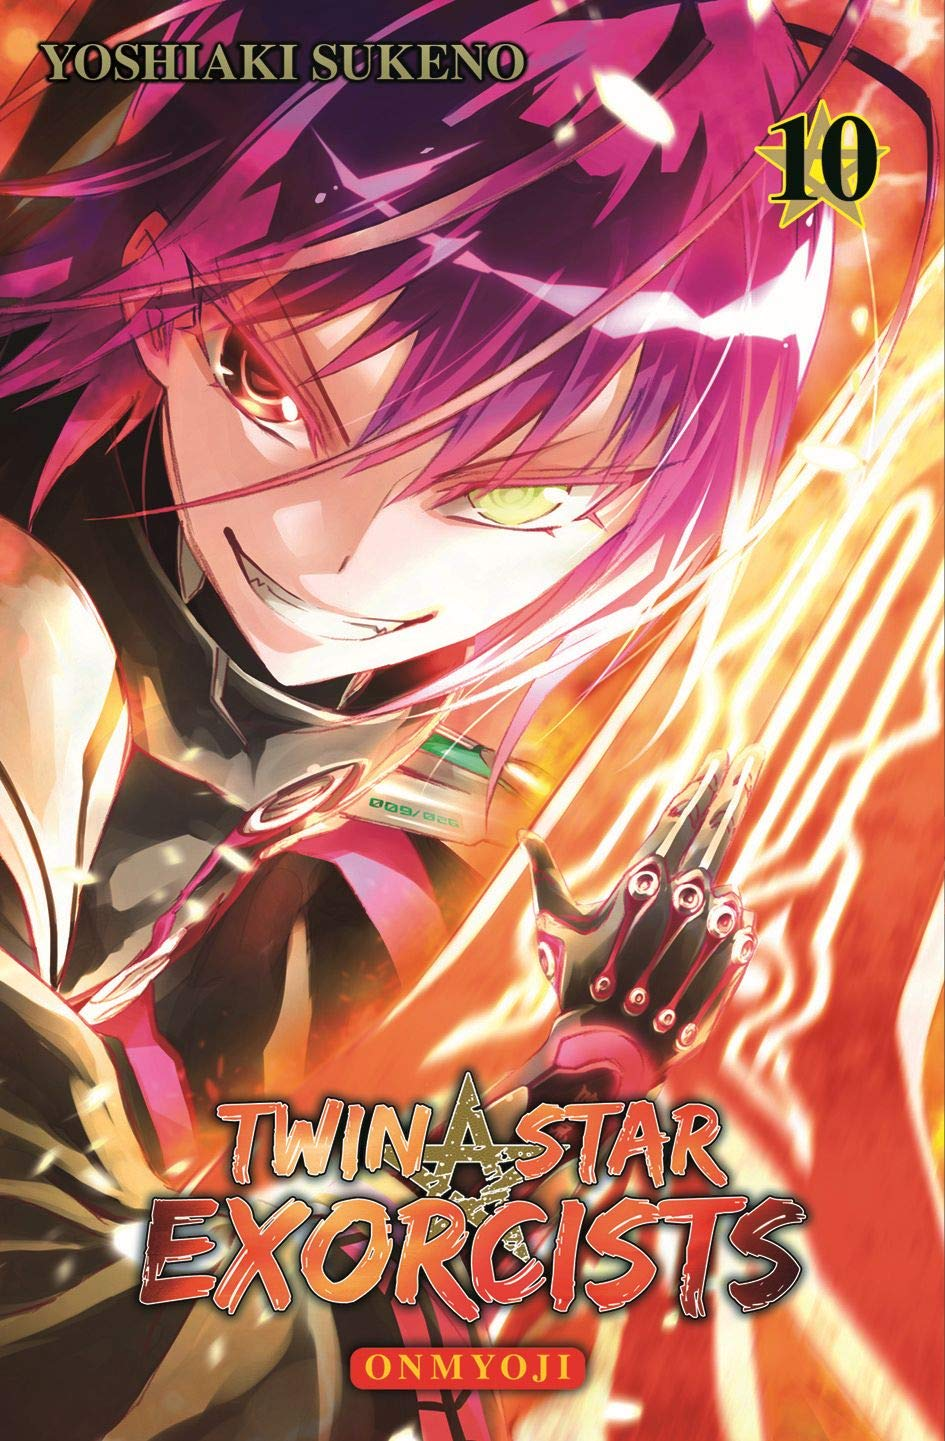 Twin Star Exorcists: Onmyoji: Bd. 10 Taschenbuch – 24. September 2018 Yoshiaki Sukeno Hiro Yamada Panini 3741608882